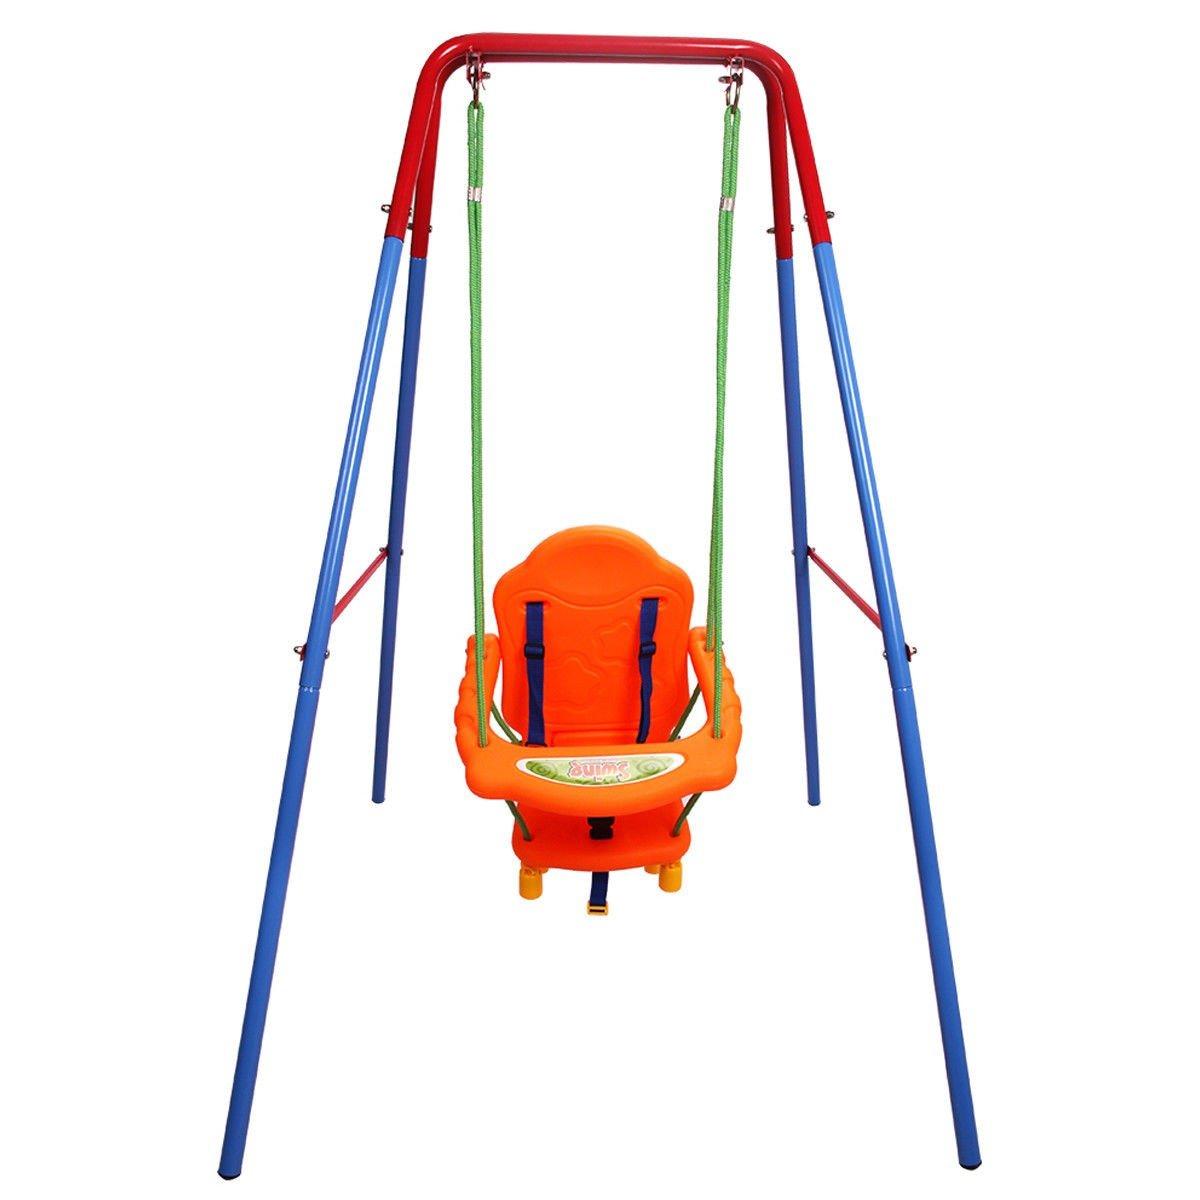 USA_BEST_SELLER 屋外 裏庭 遊び場 子供用 ブランコセット ロープ 本格的な遊び場体験 B07JQ2B5SL